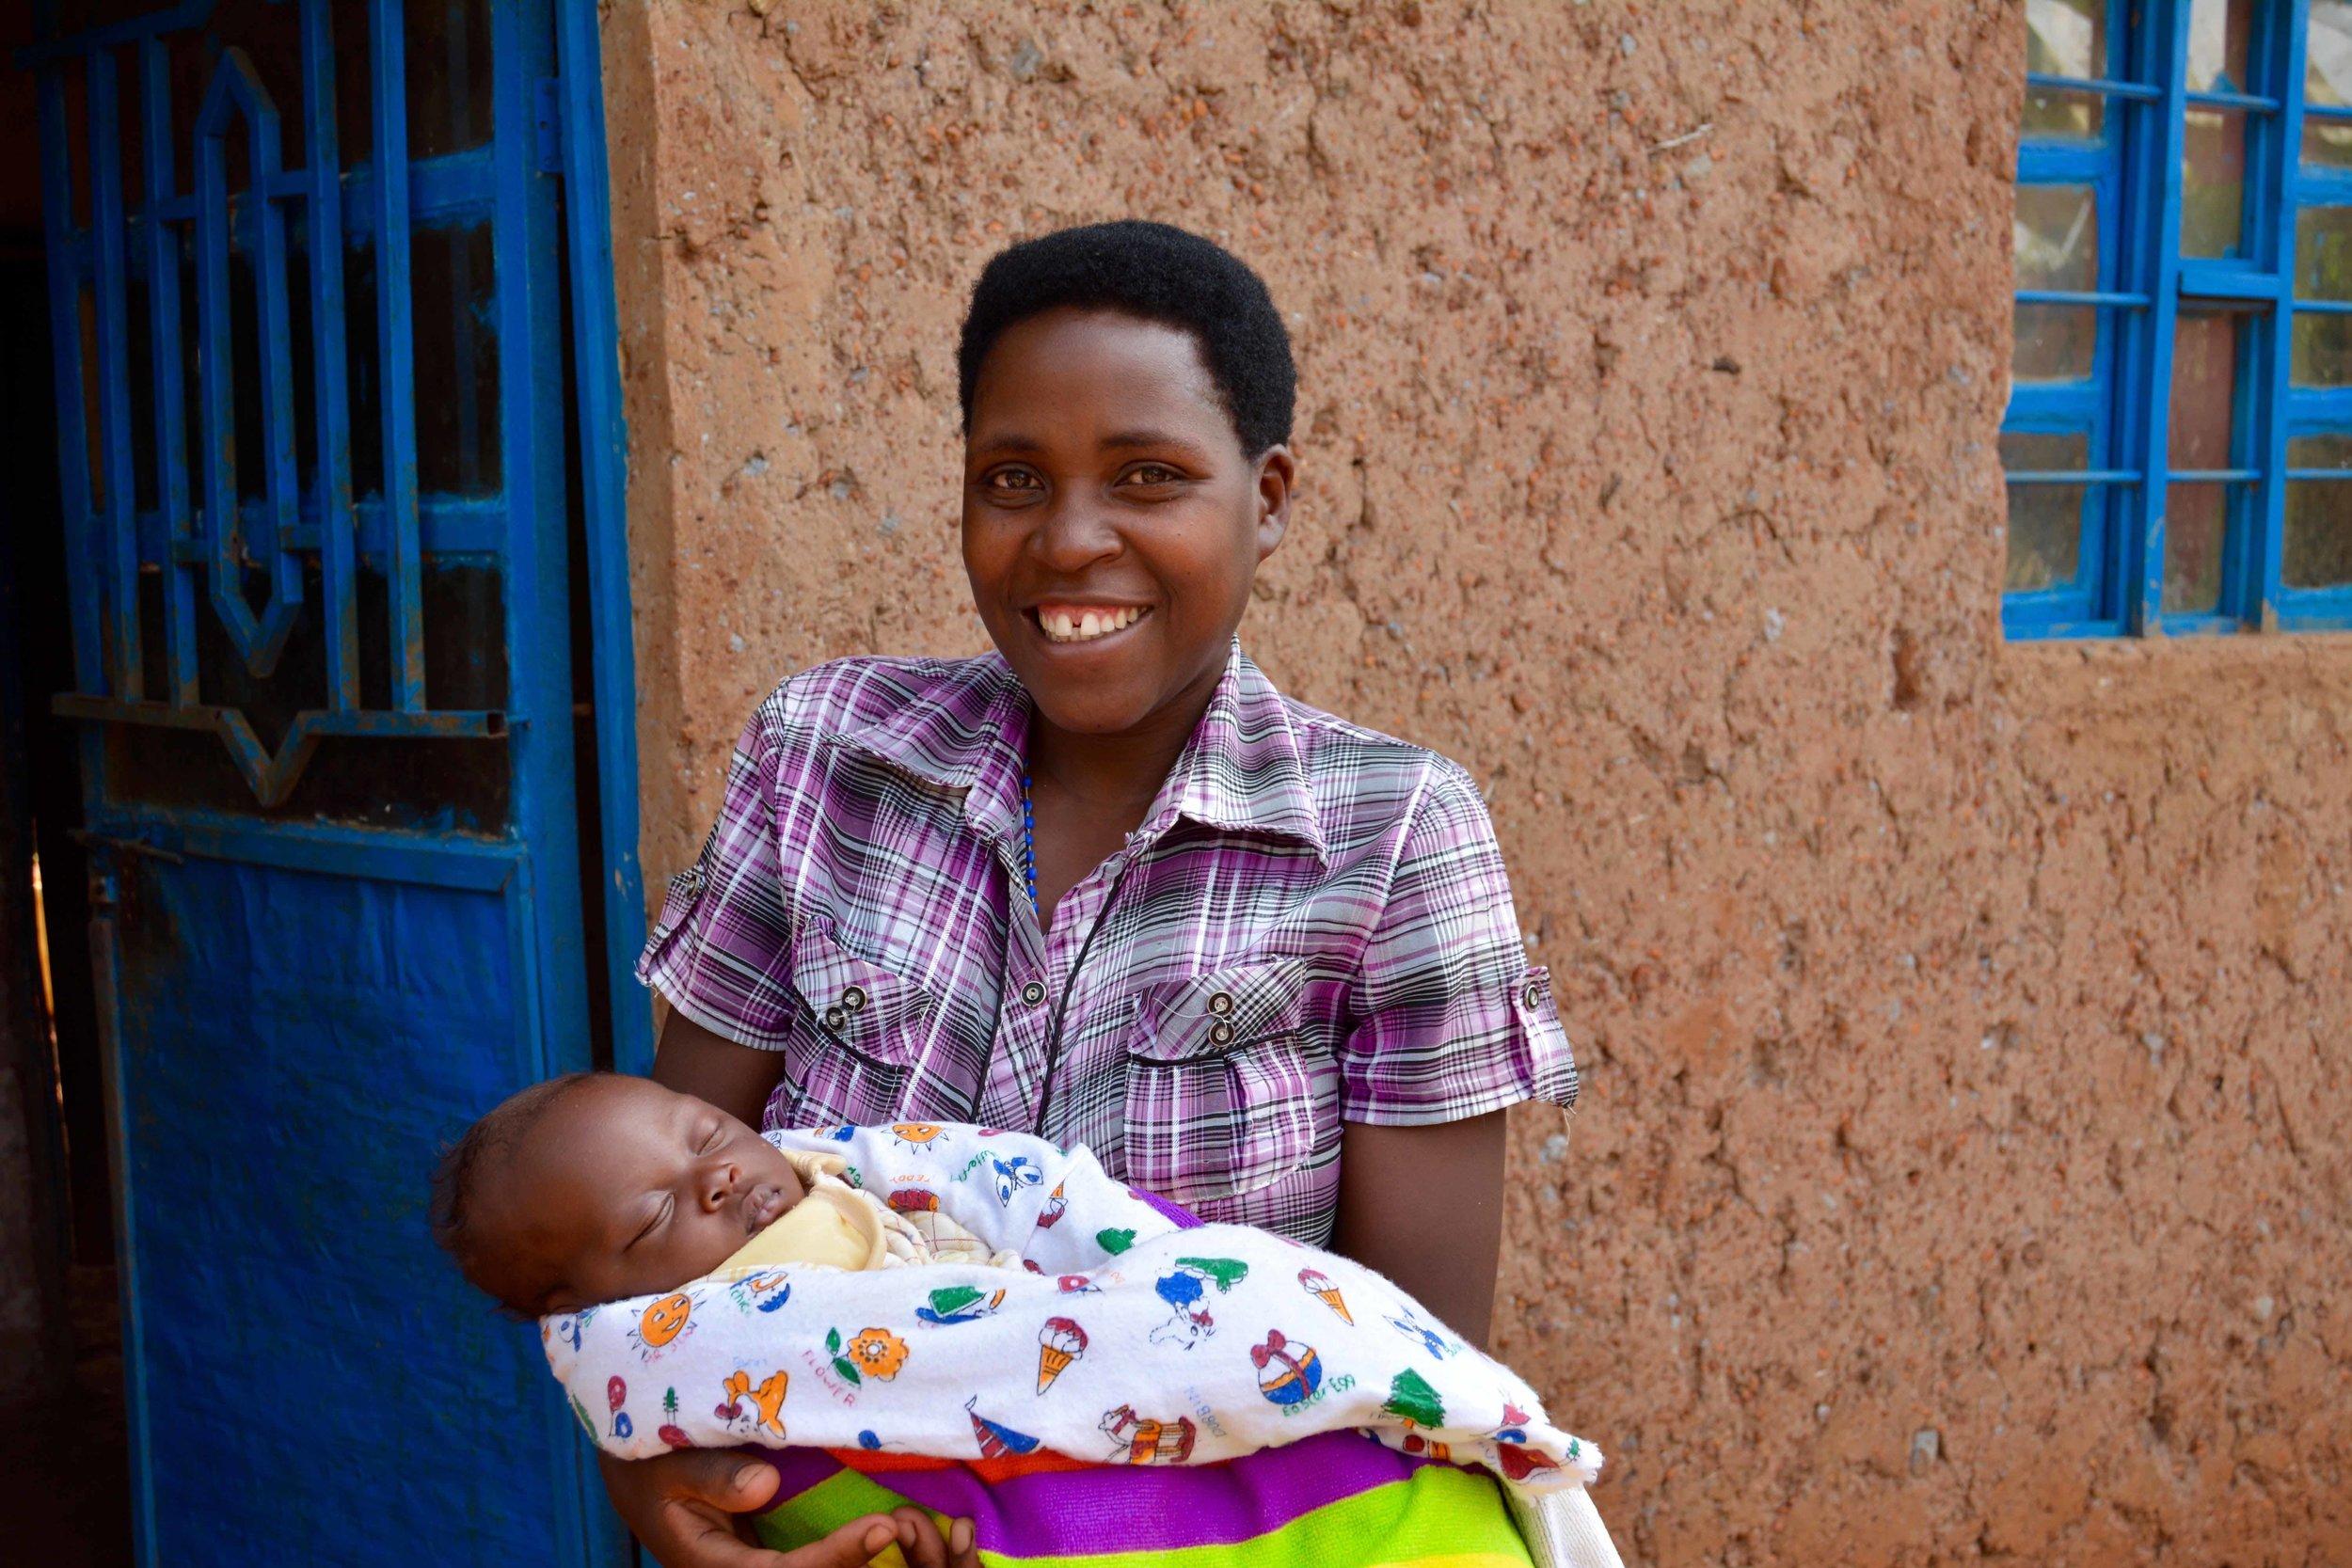 Nyiranganduhimana Claudine with newborn baby Nuwayezu Theogène Aimée.